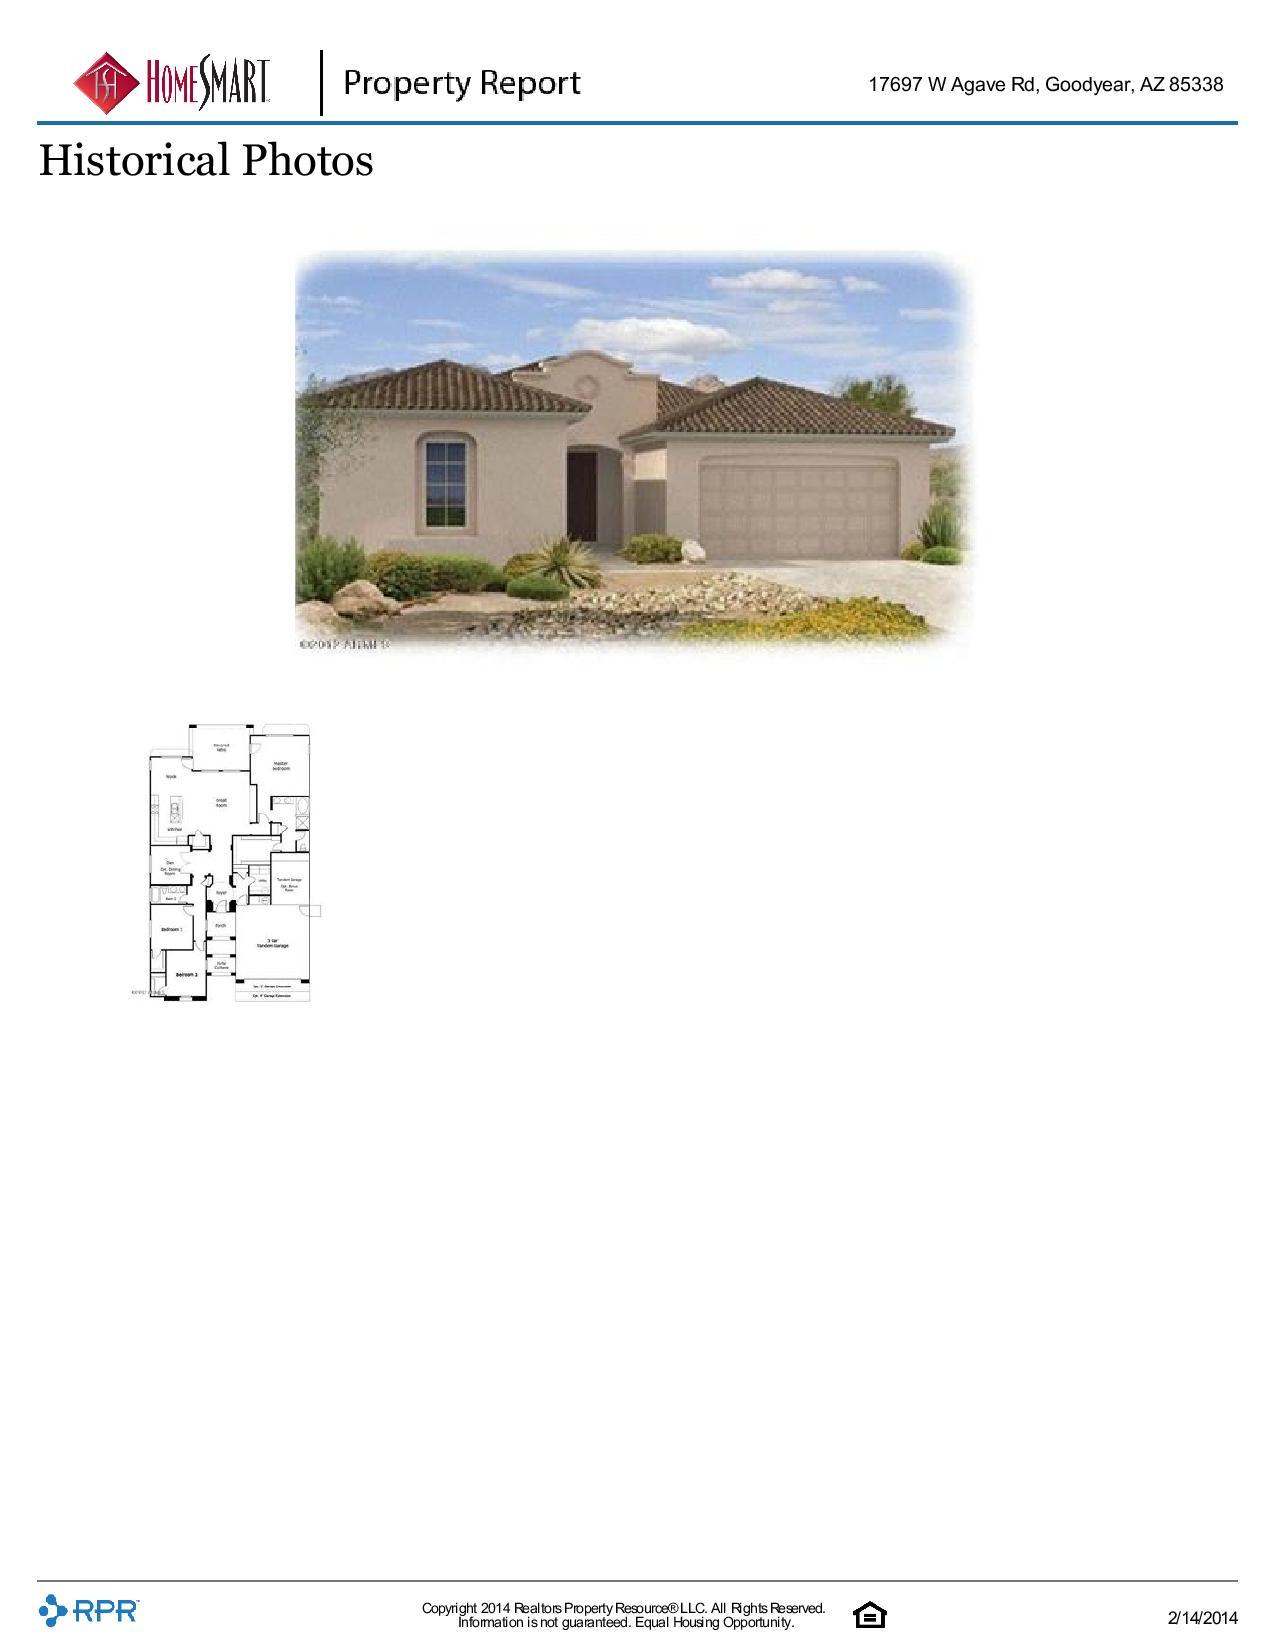 17697-W-Agave-Rd-Goodyear-AZ-85338-page-007